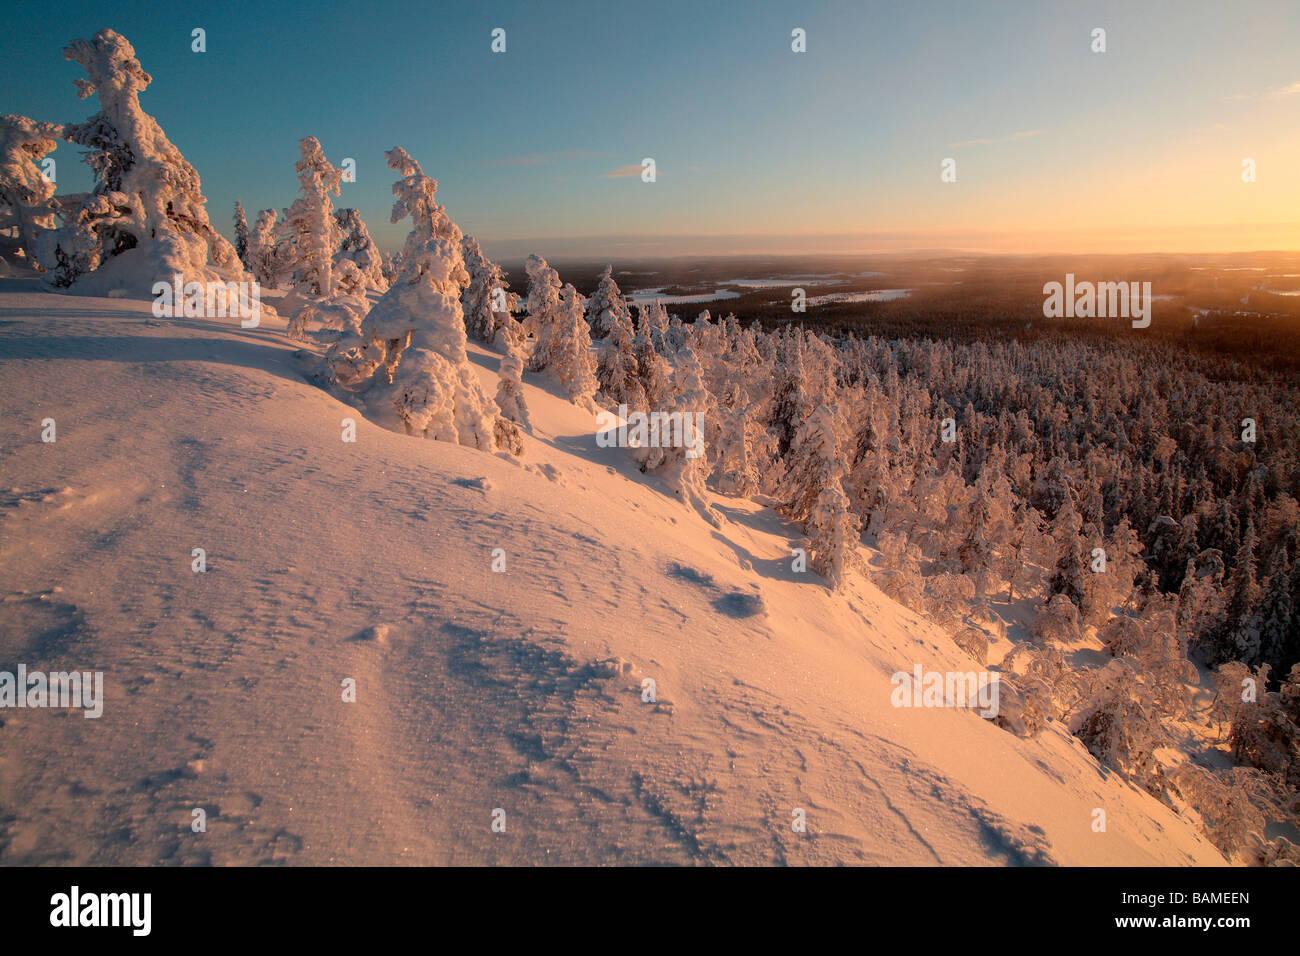 Finland, Lapland Province, Kuusamo, Ruka Jarvi, sunrise over the Taiga Stock Photo